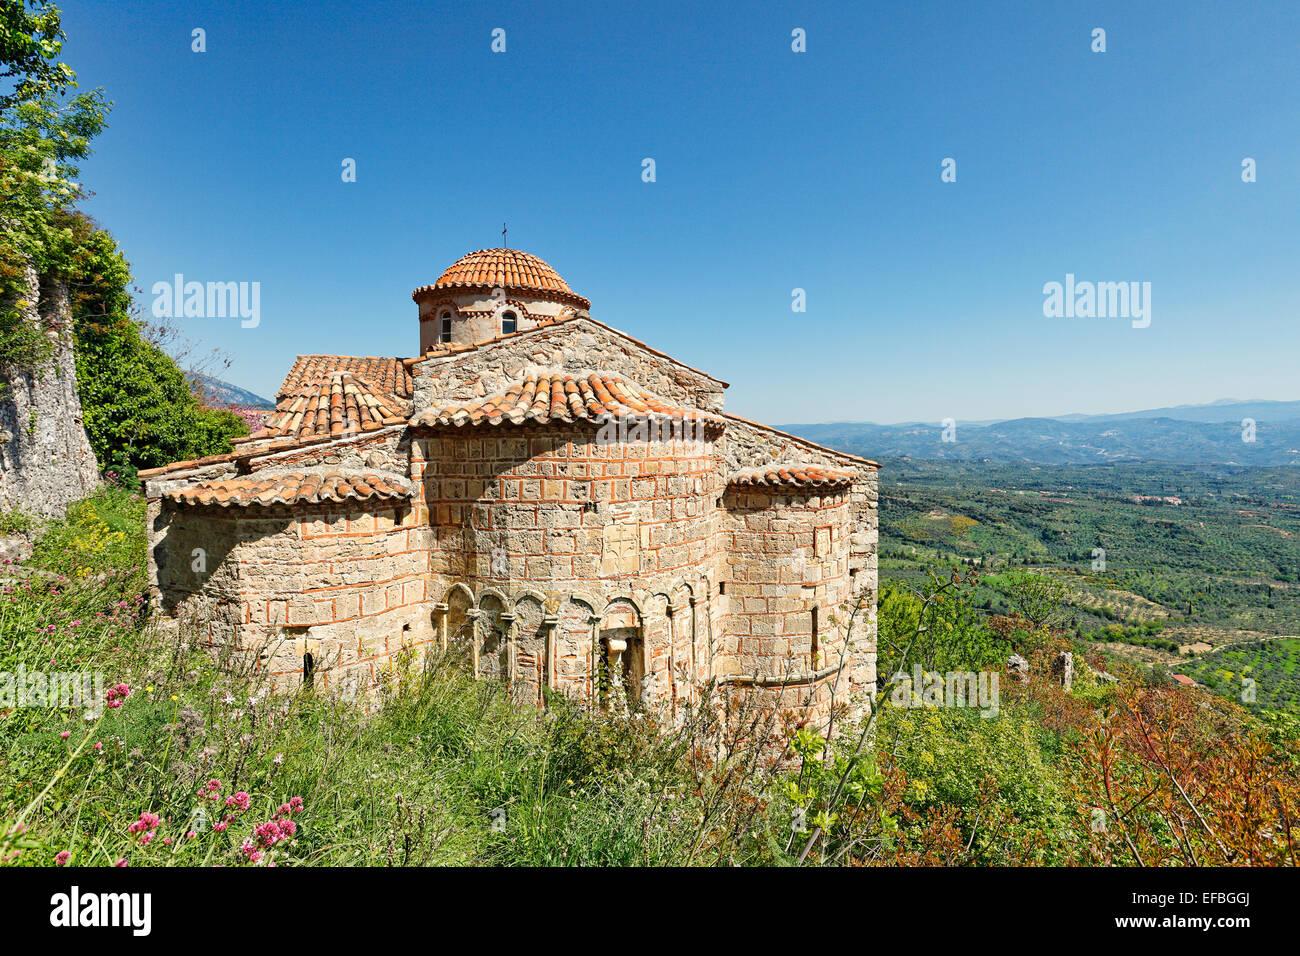 The church of Saint Nikolaos in Mystras, Greece - Stock Image